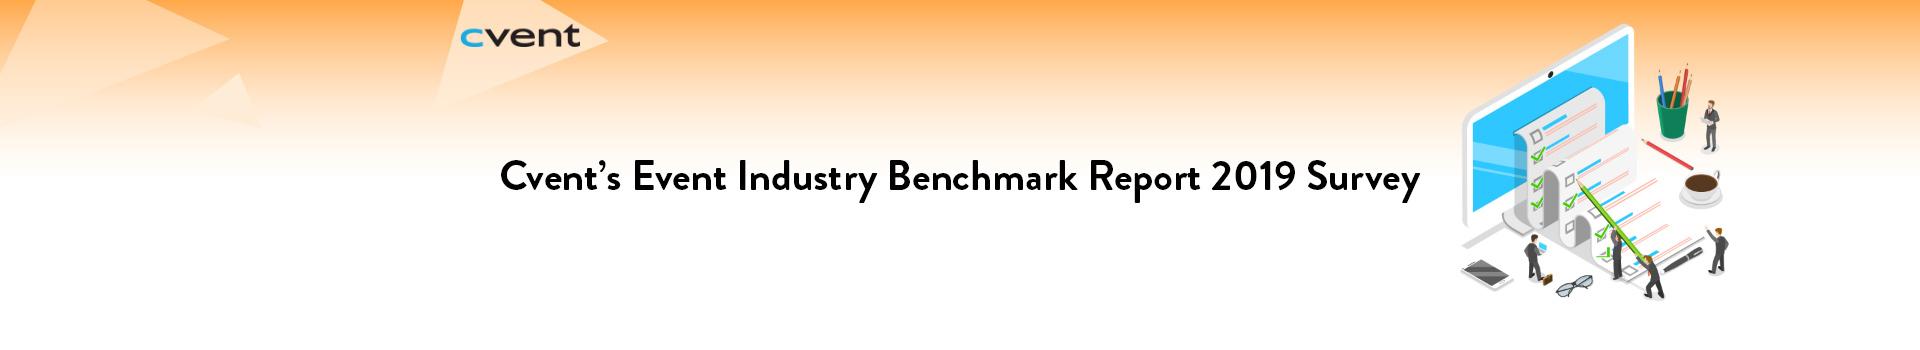 Cvent's Event Industry Benchmark Report 2019 Survey